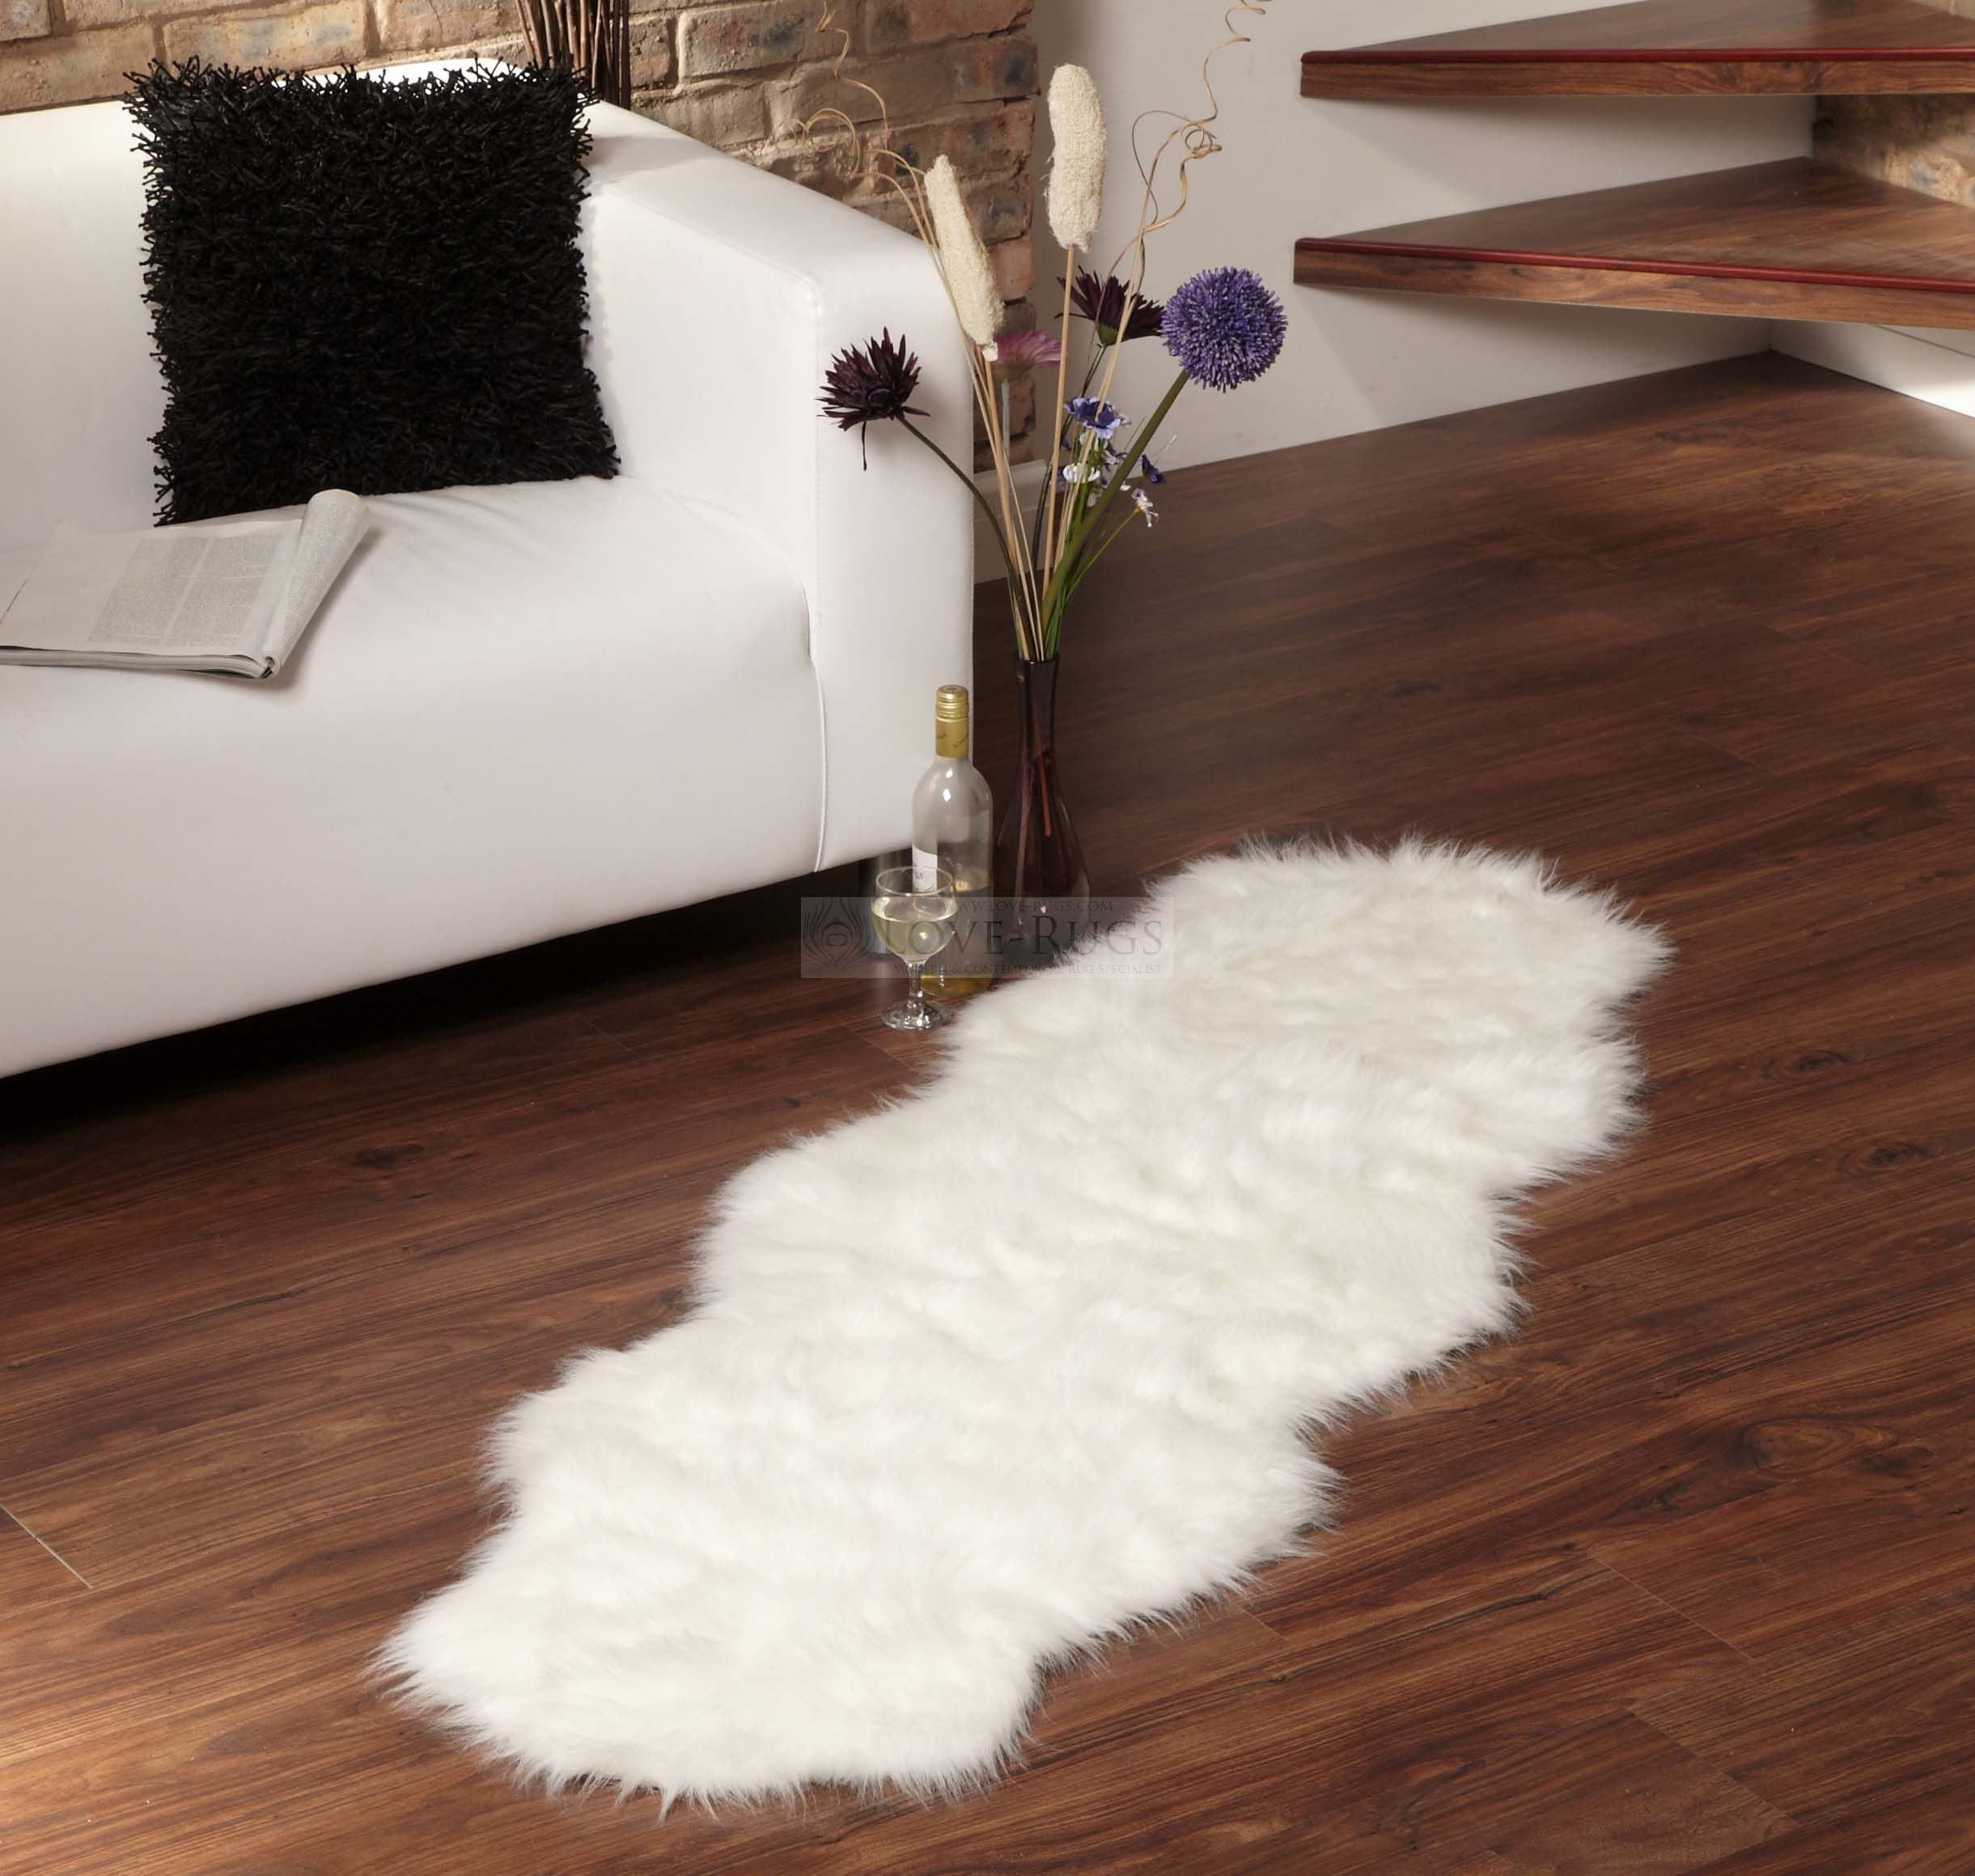 comfy faux sheepskin rug for floor decor ideas: faux sheepskin rug